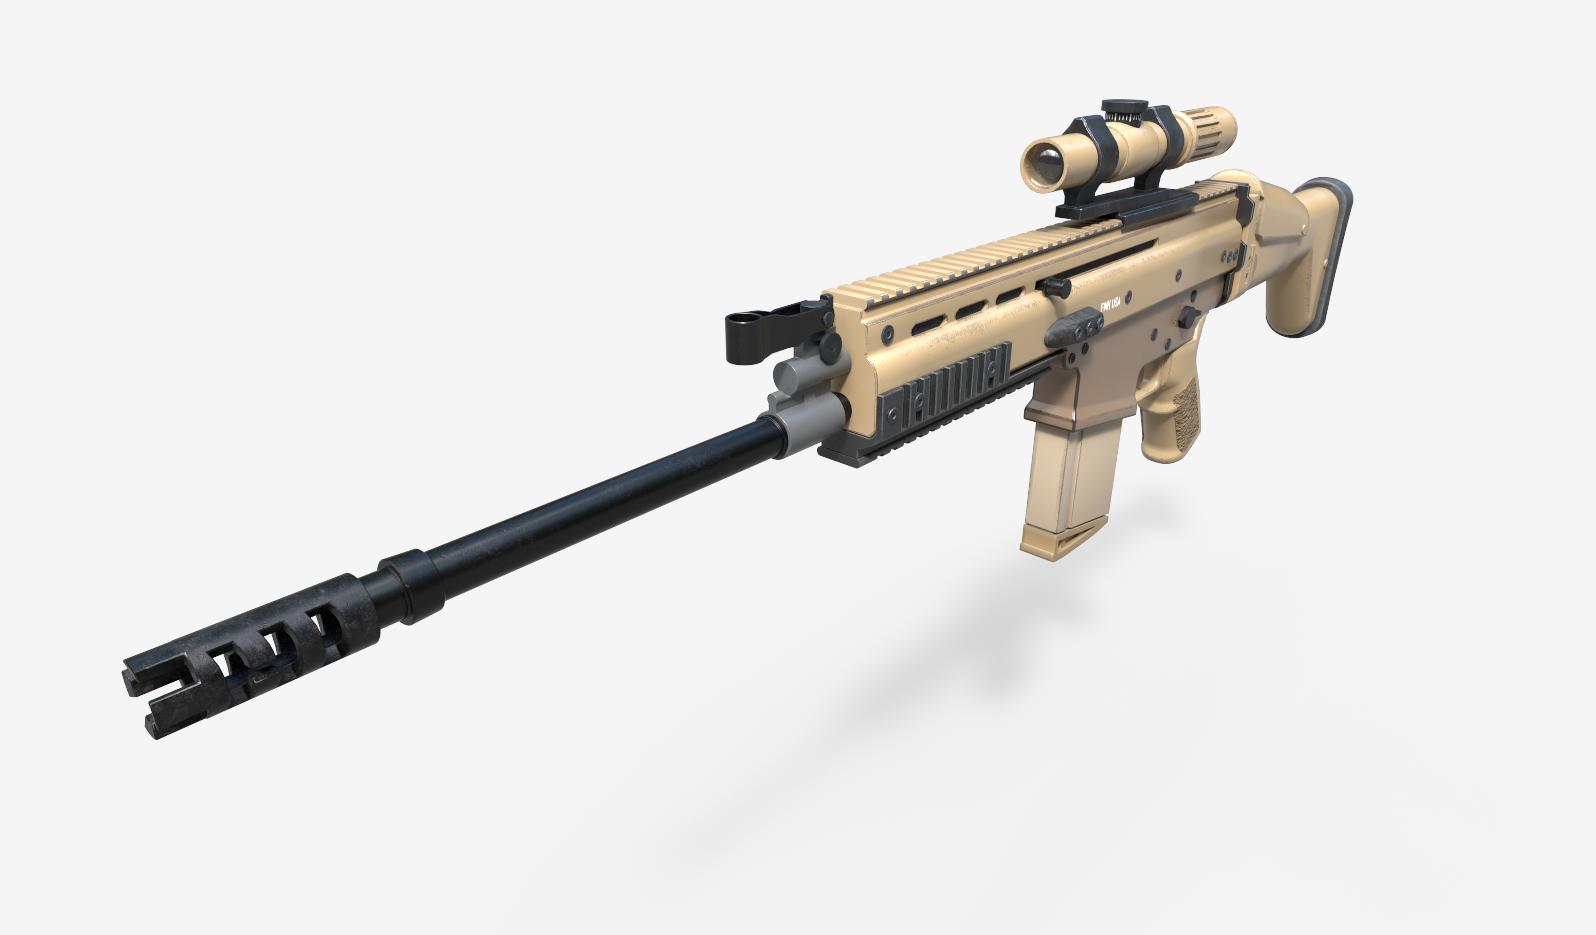 Rifle - FN Scar 17s